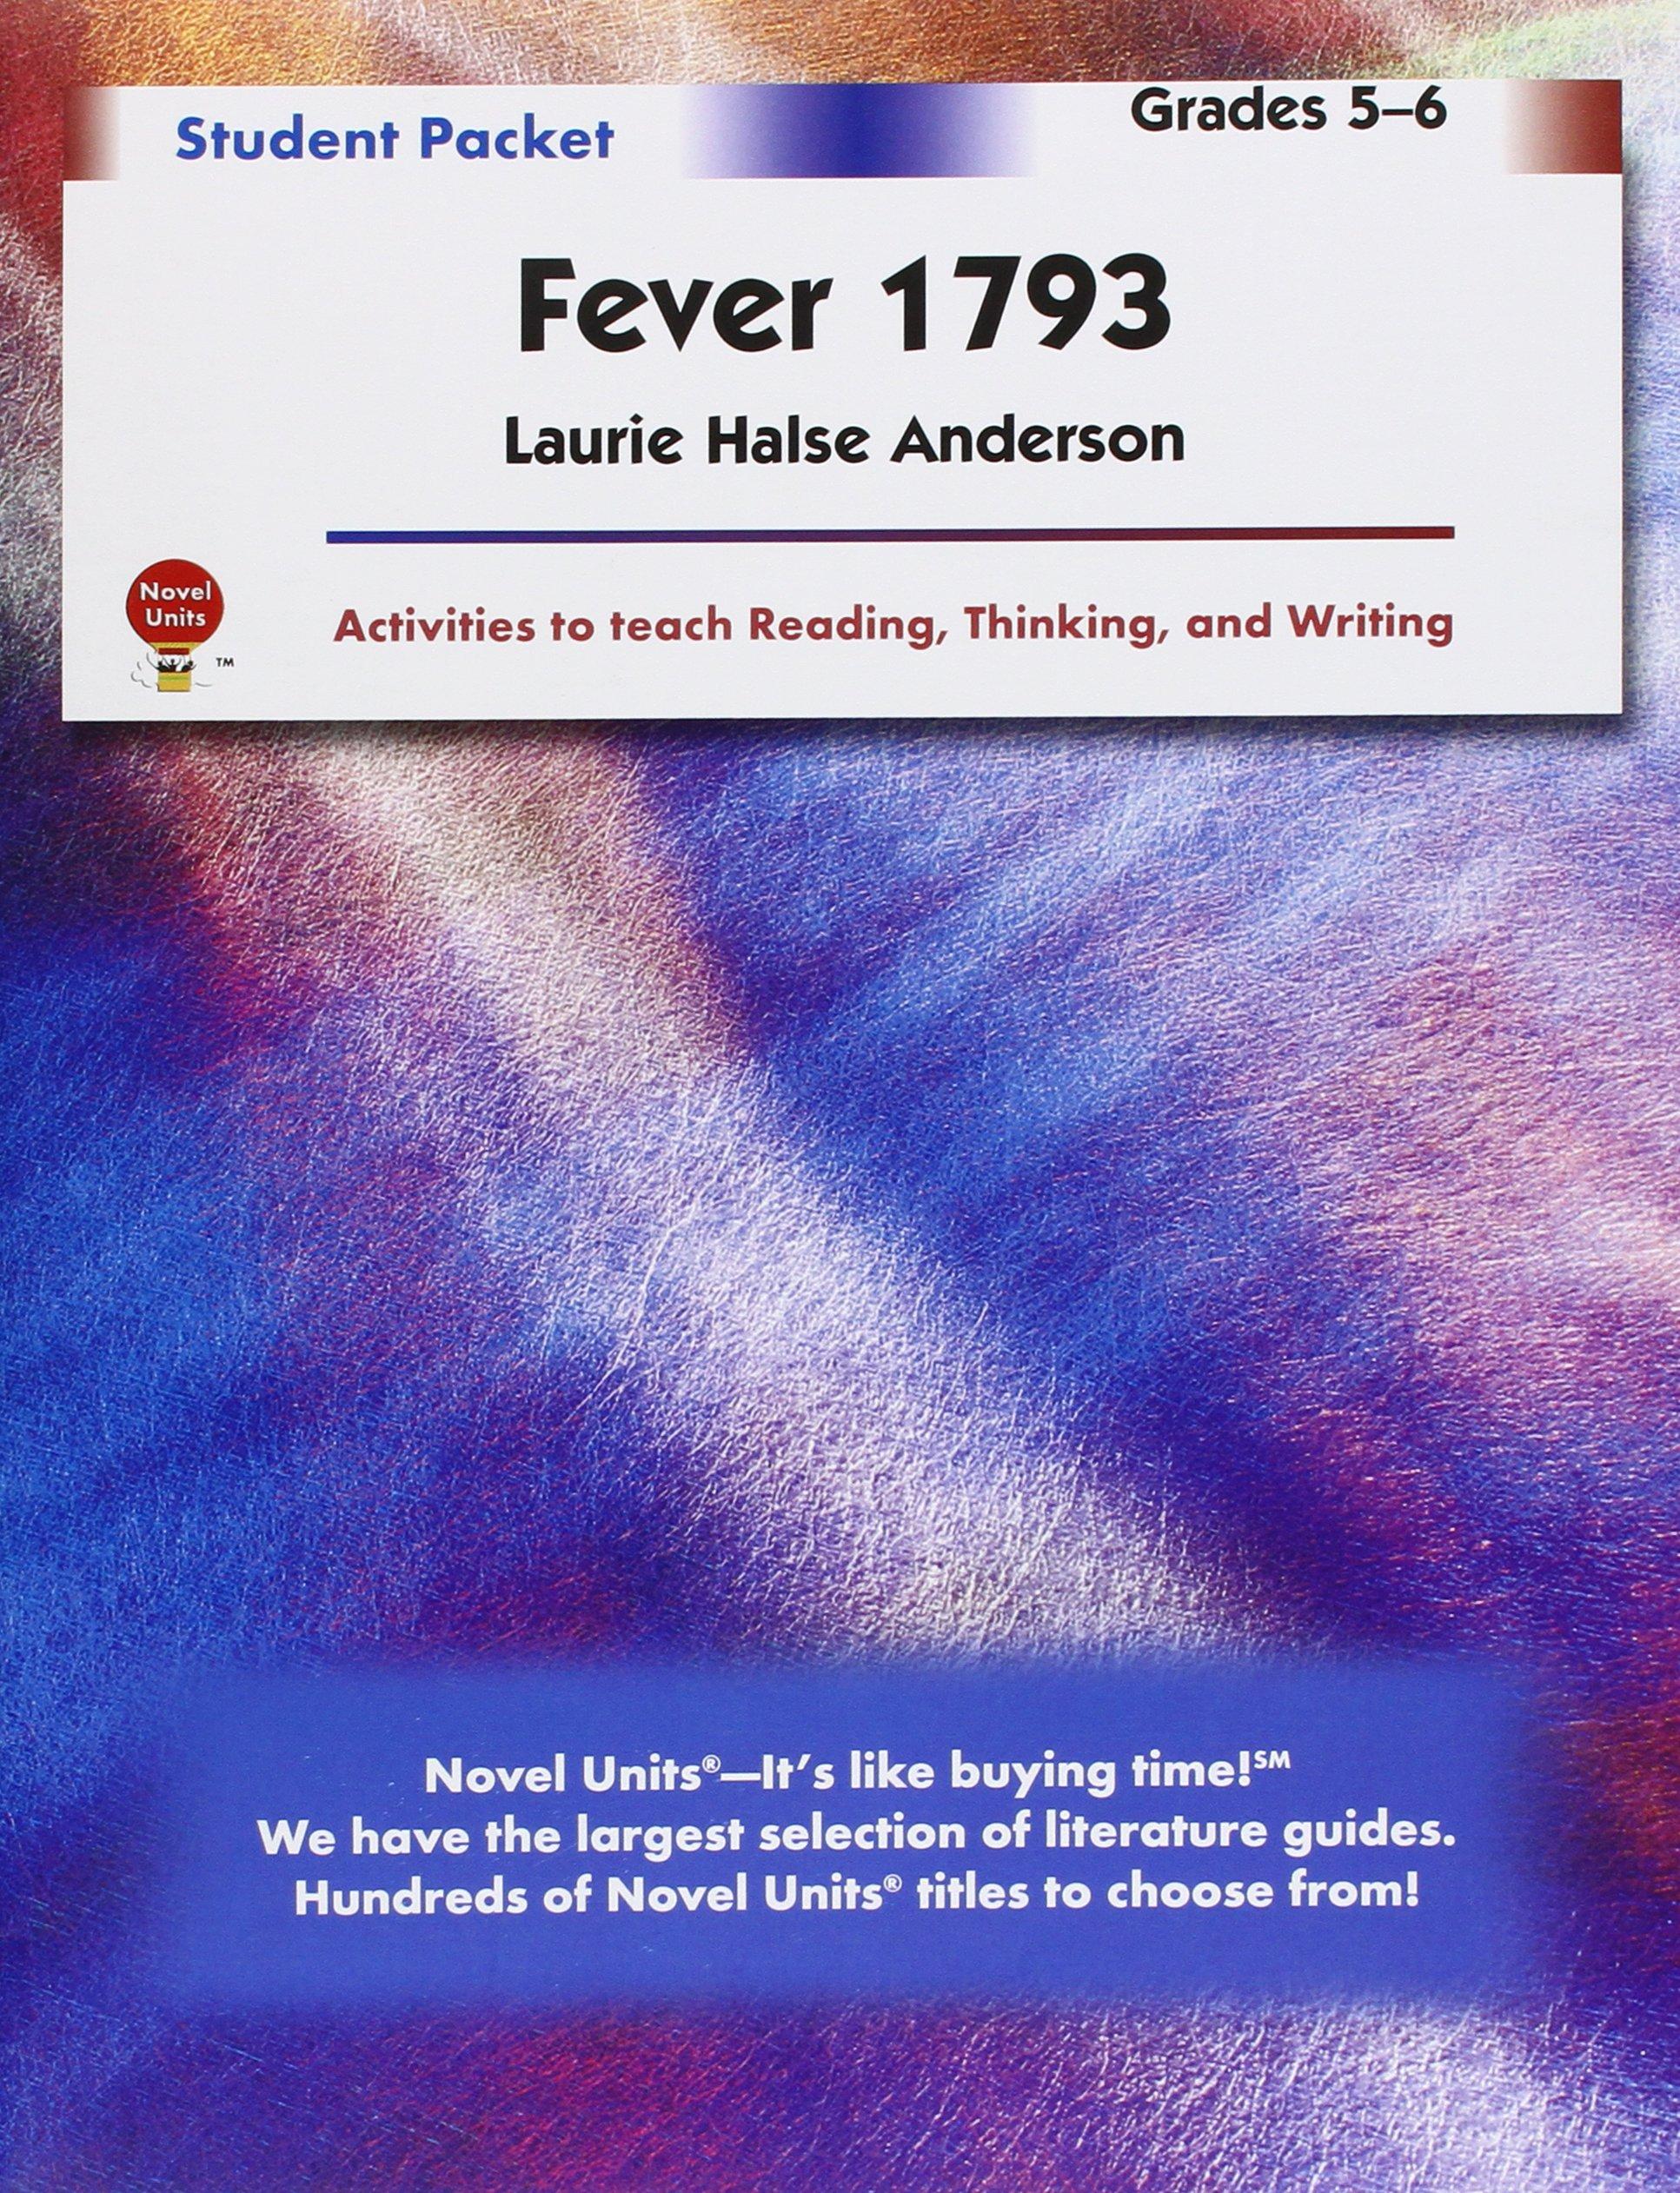 Fever 1793 student packet by novel units novel units fever 1793 student packet by novel units novel units 9781581308952 amazon books fandeluxe Images